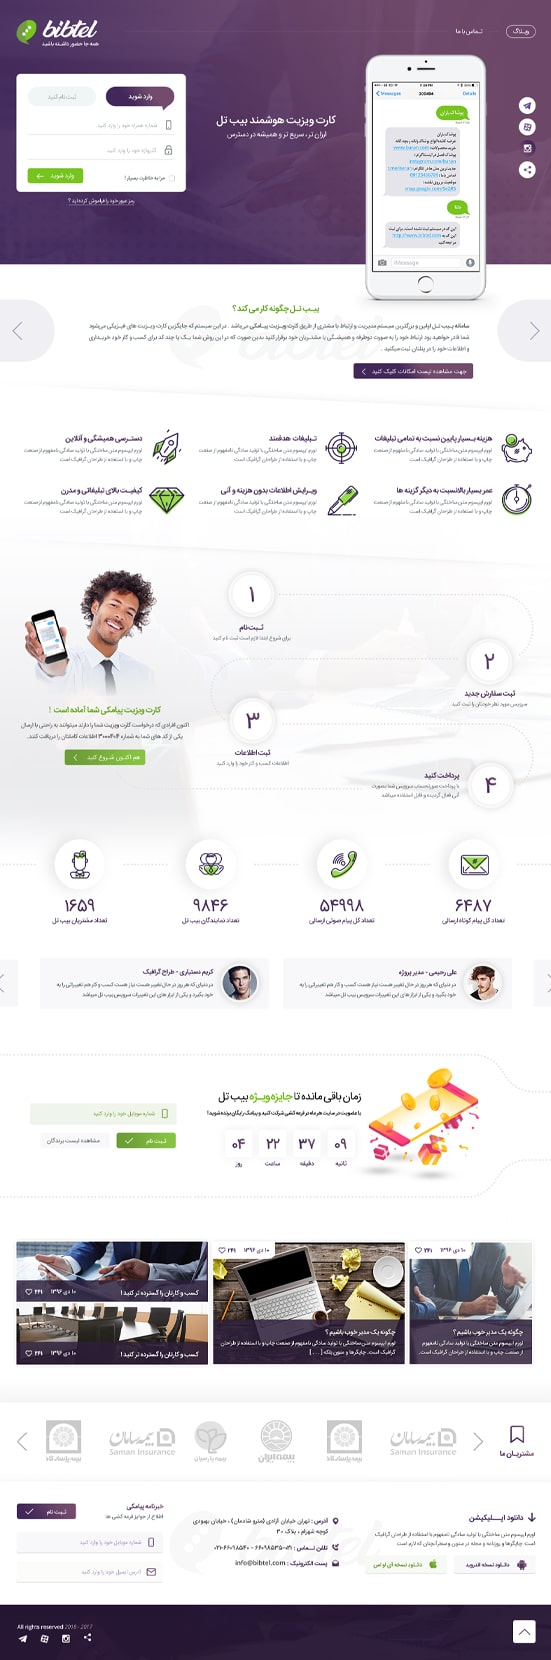 طراحی سایت بیبتل